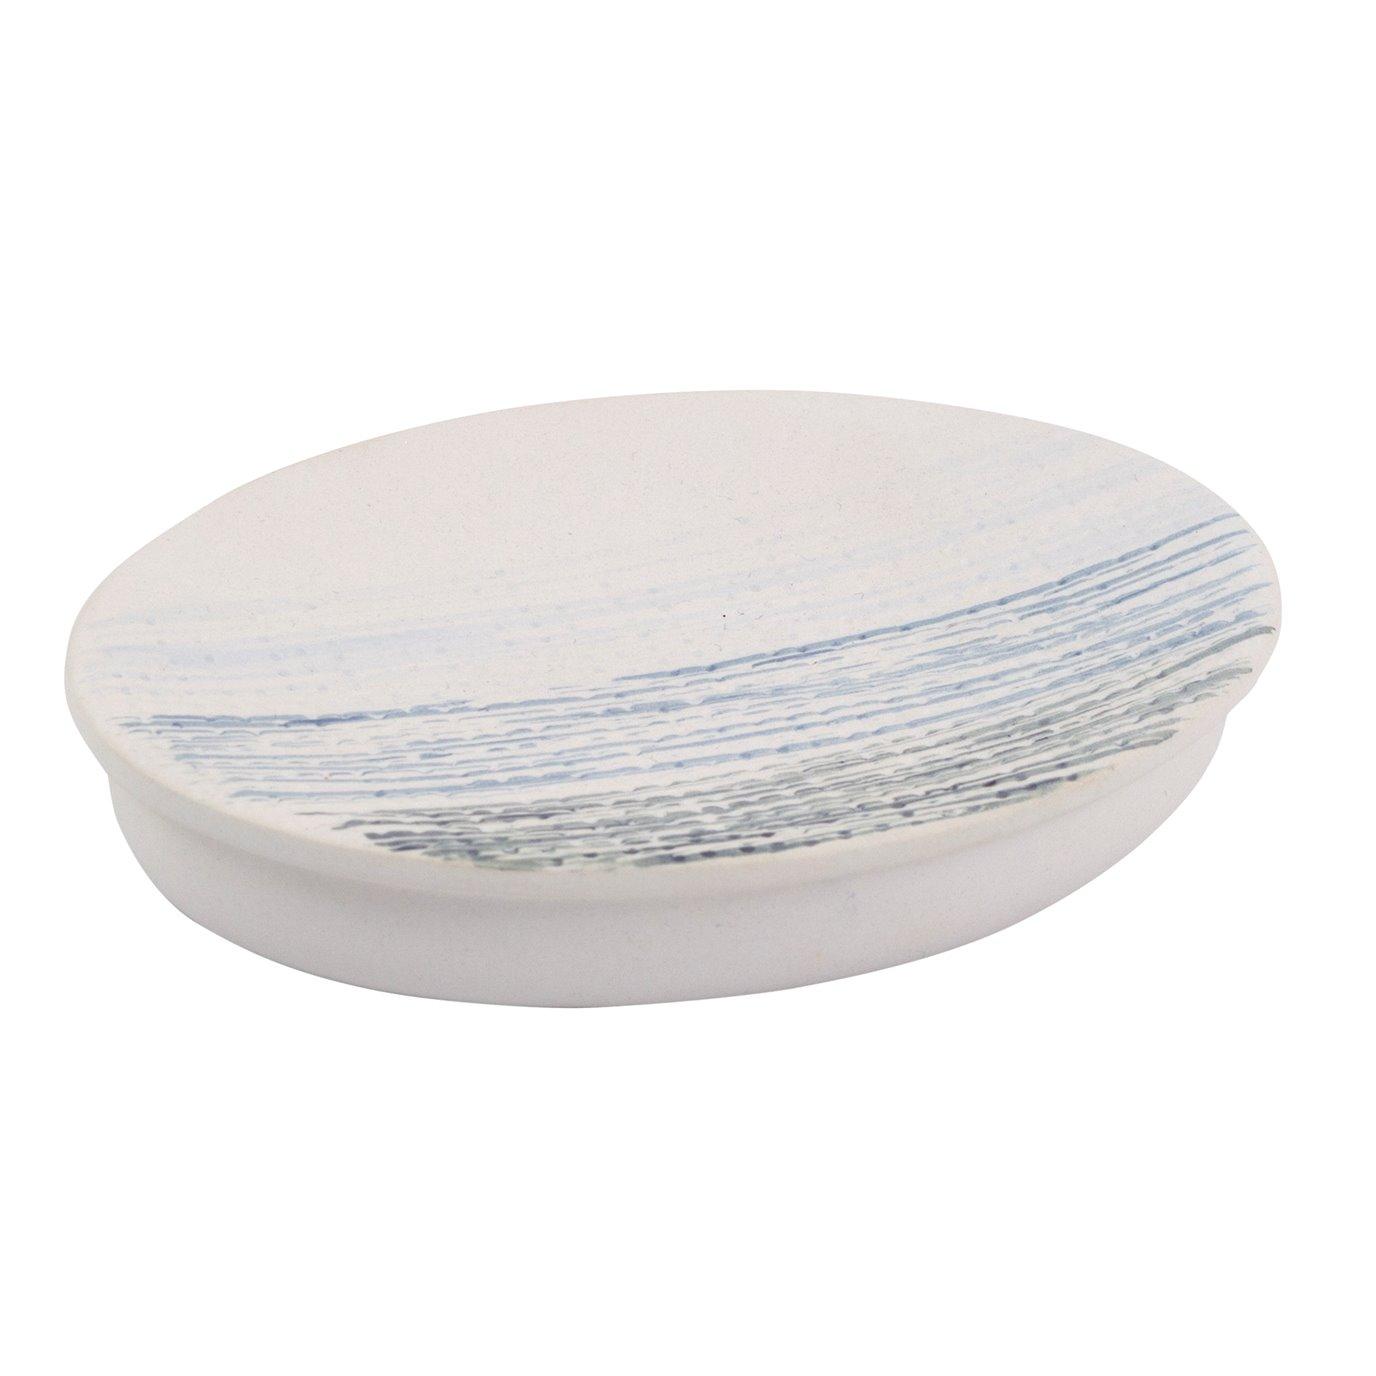 Nomad Soap Dish